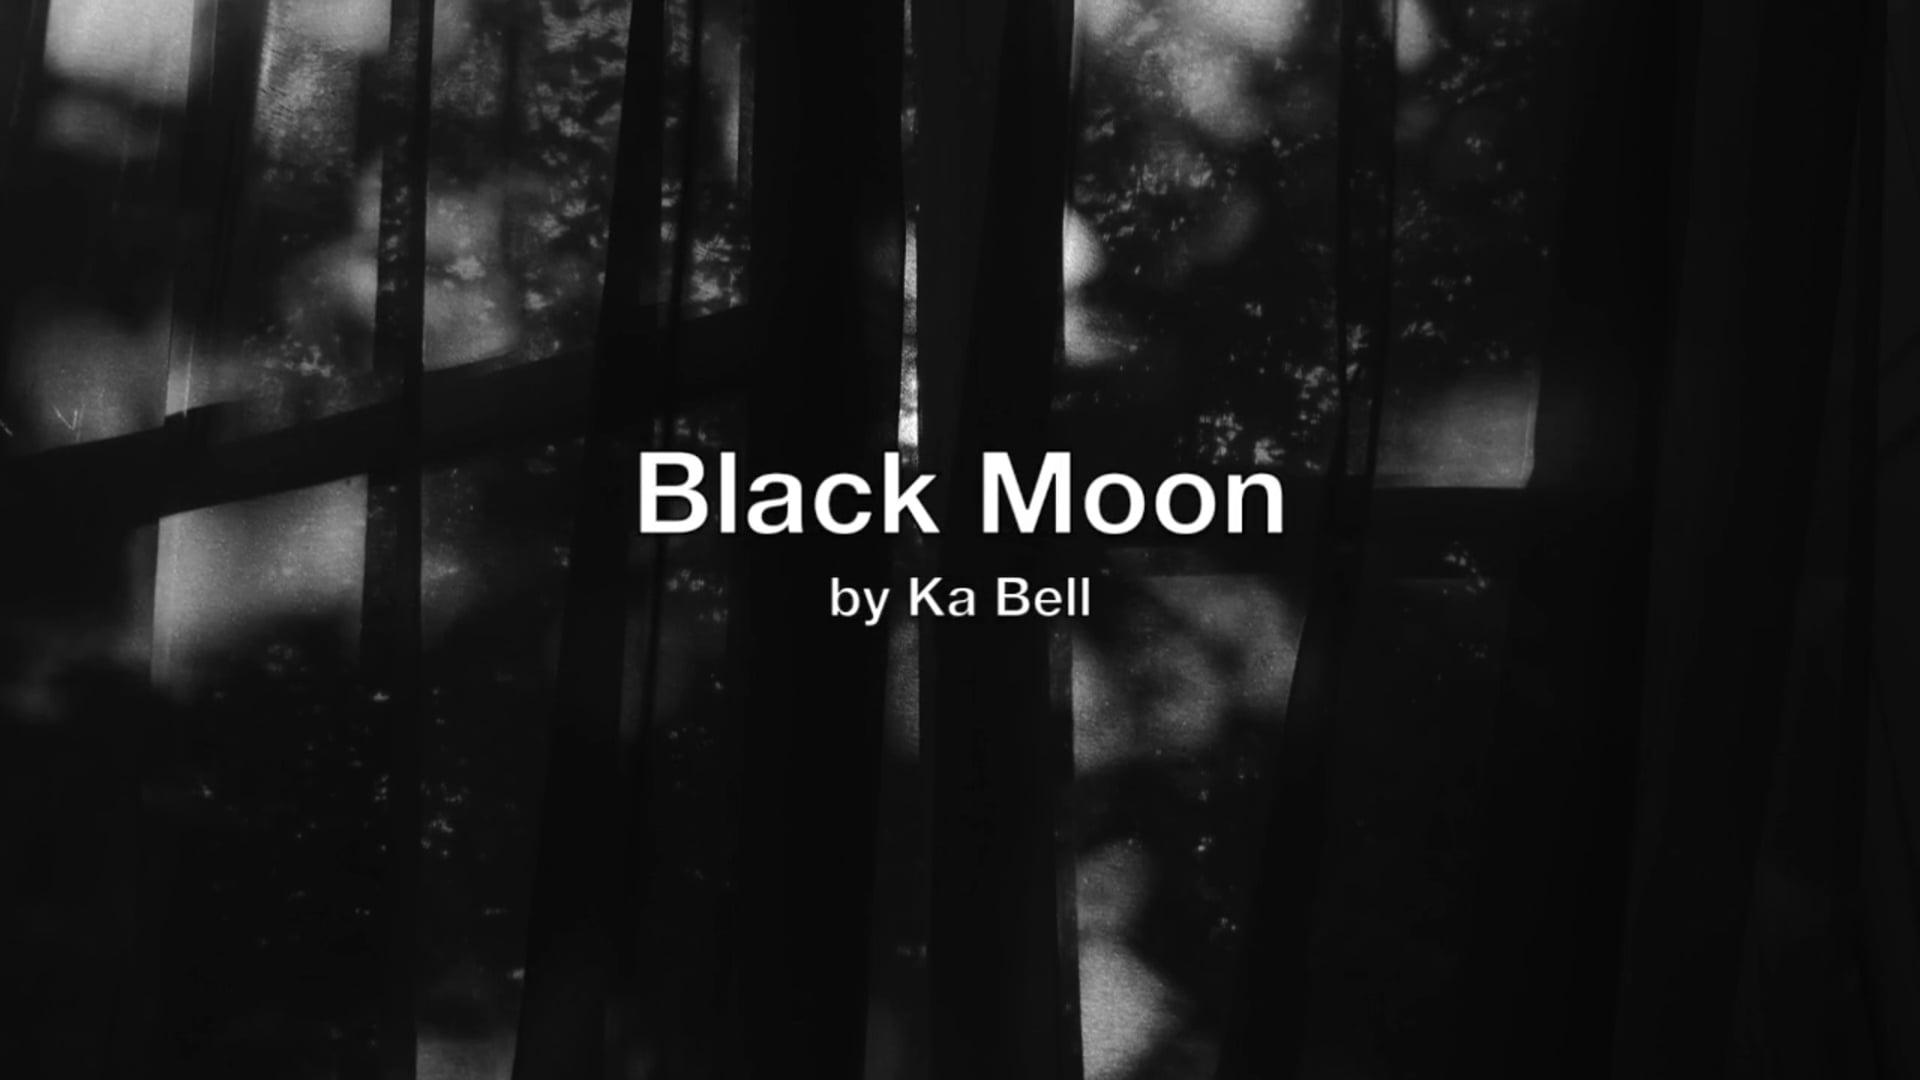 Black Moon by Ka Bell